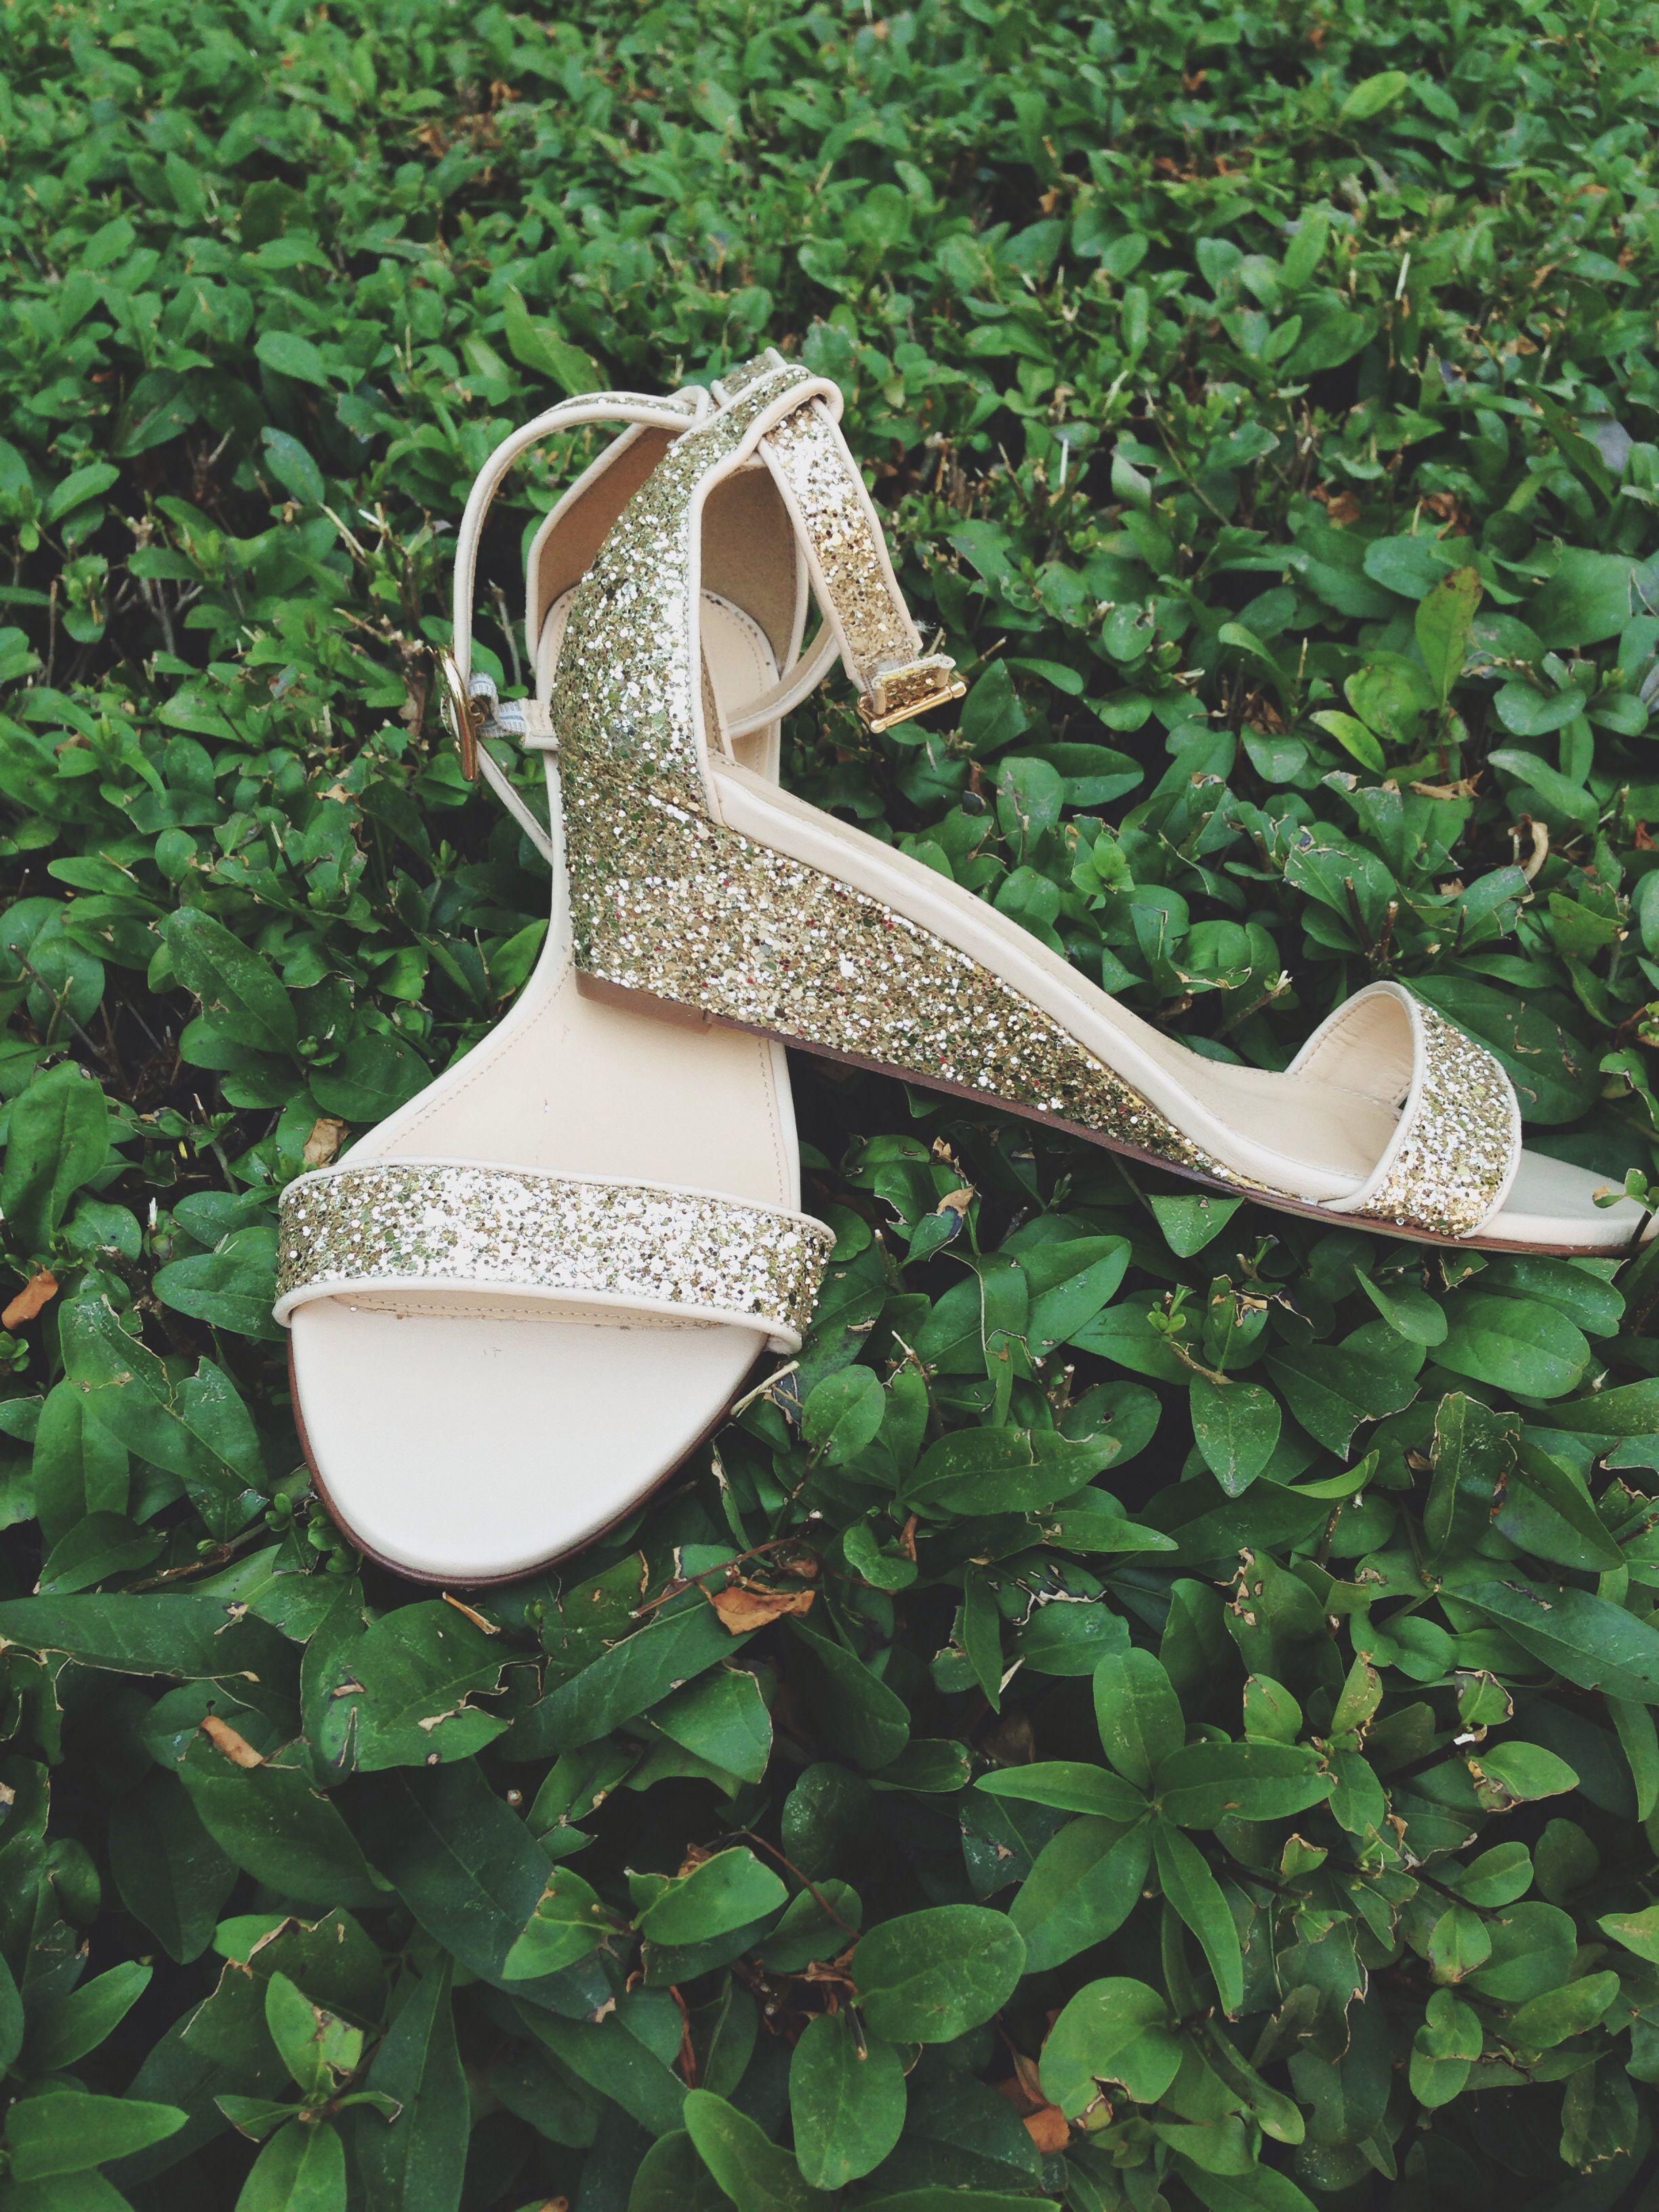 Glittery sandals.